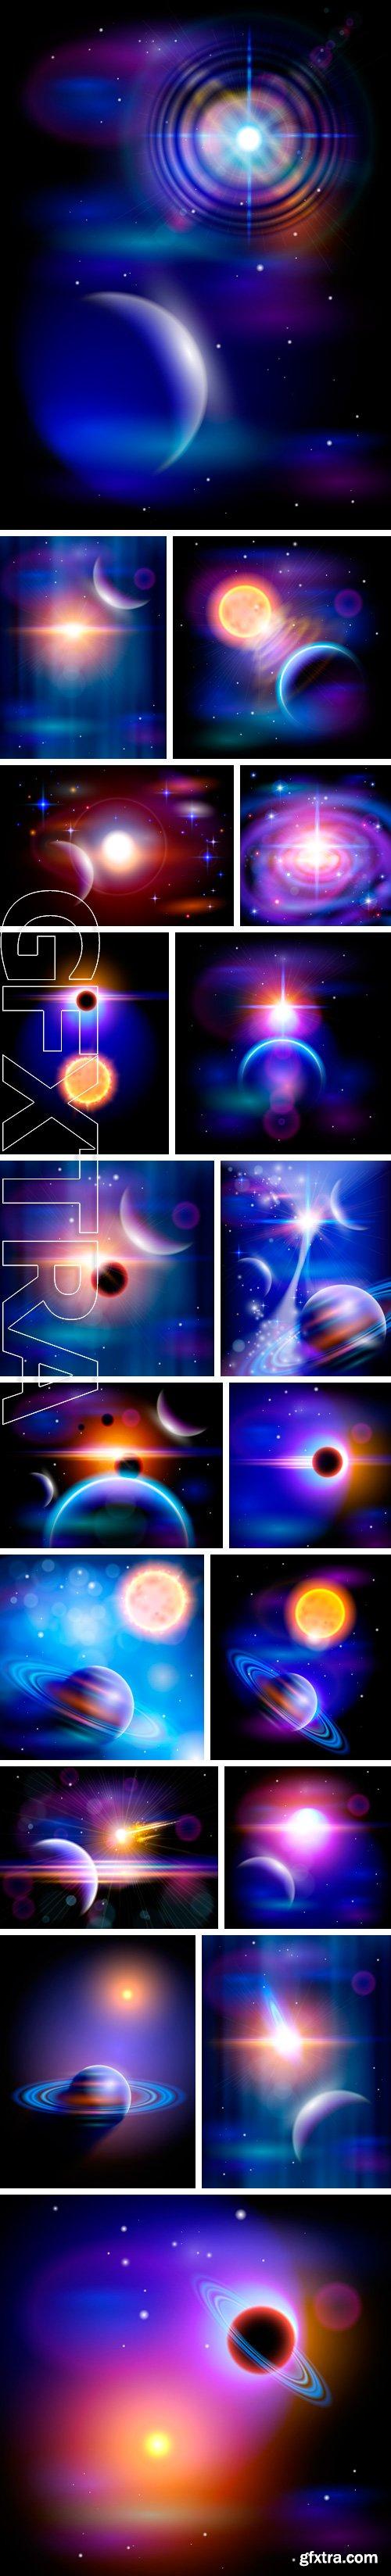 Stock Vectors - Magic Space. Vector illustration